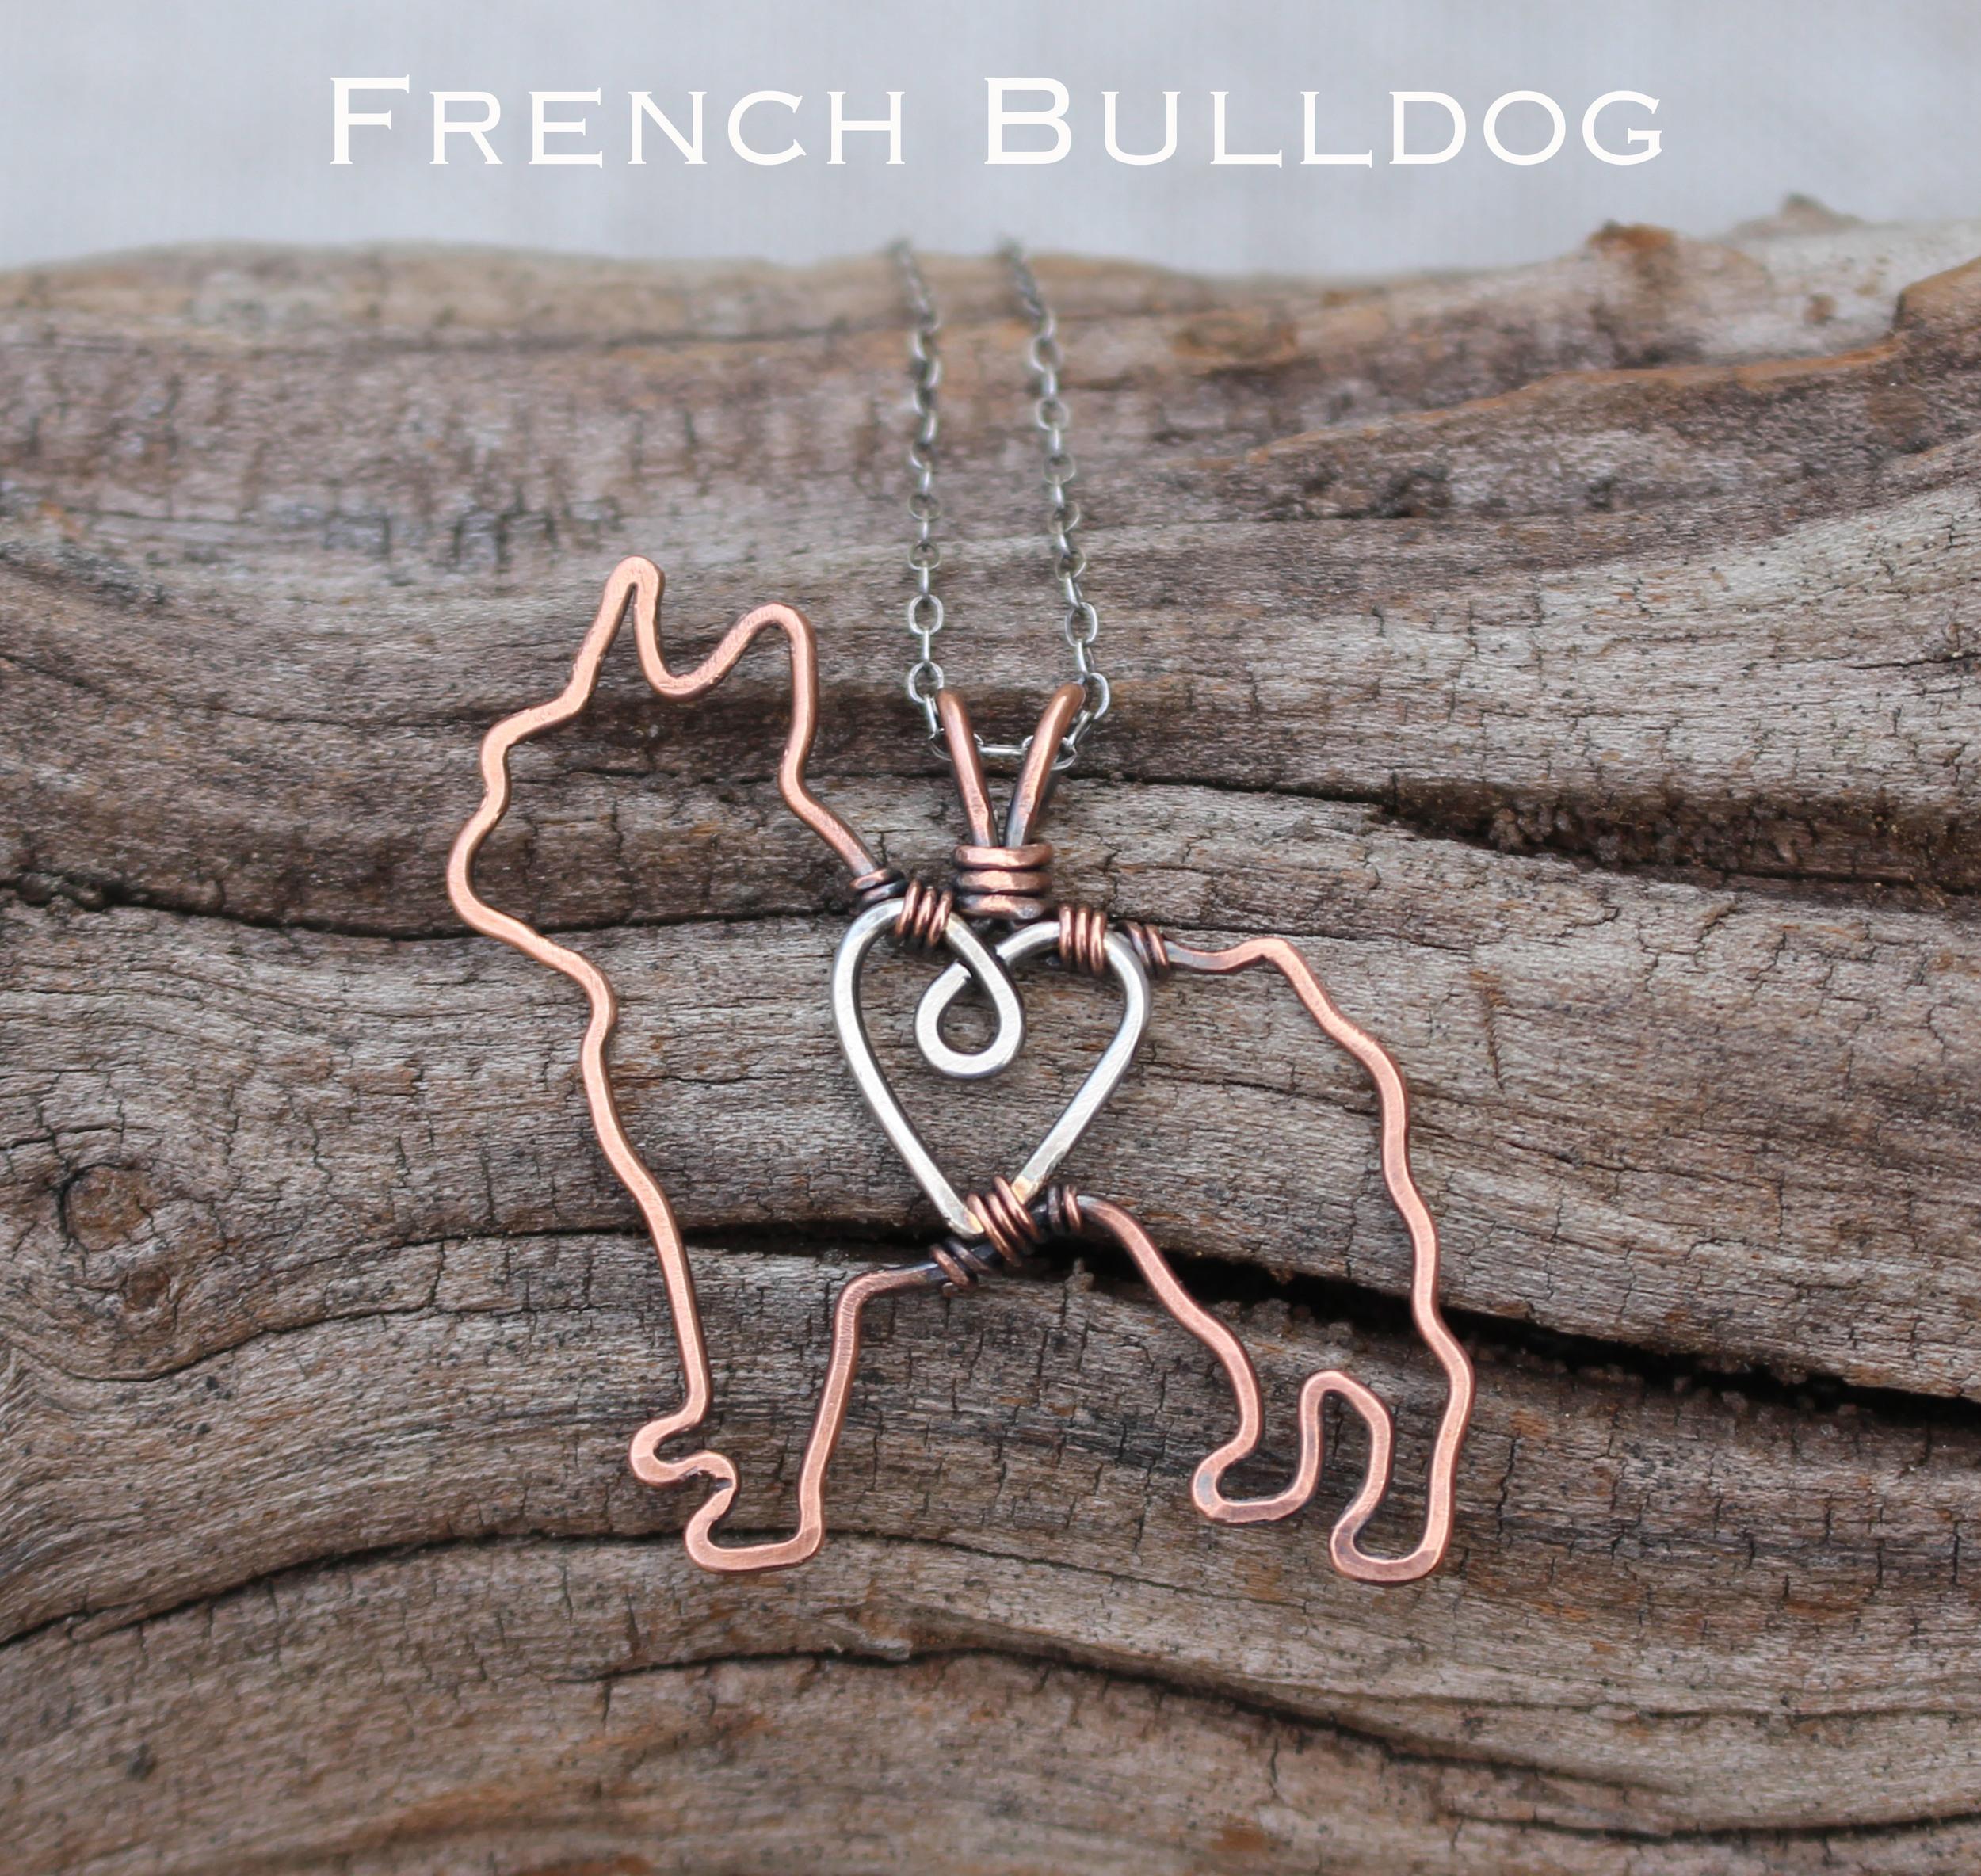 french bulldog2.jpg